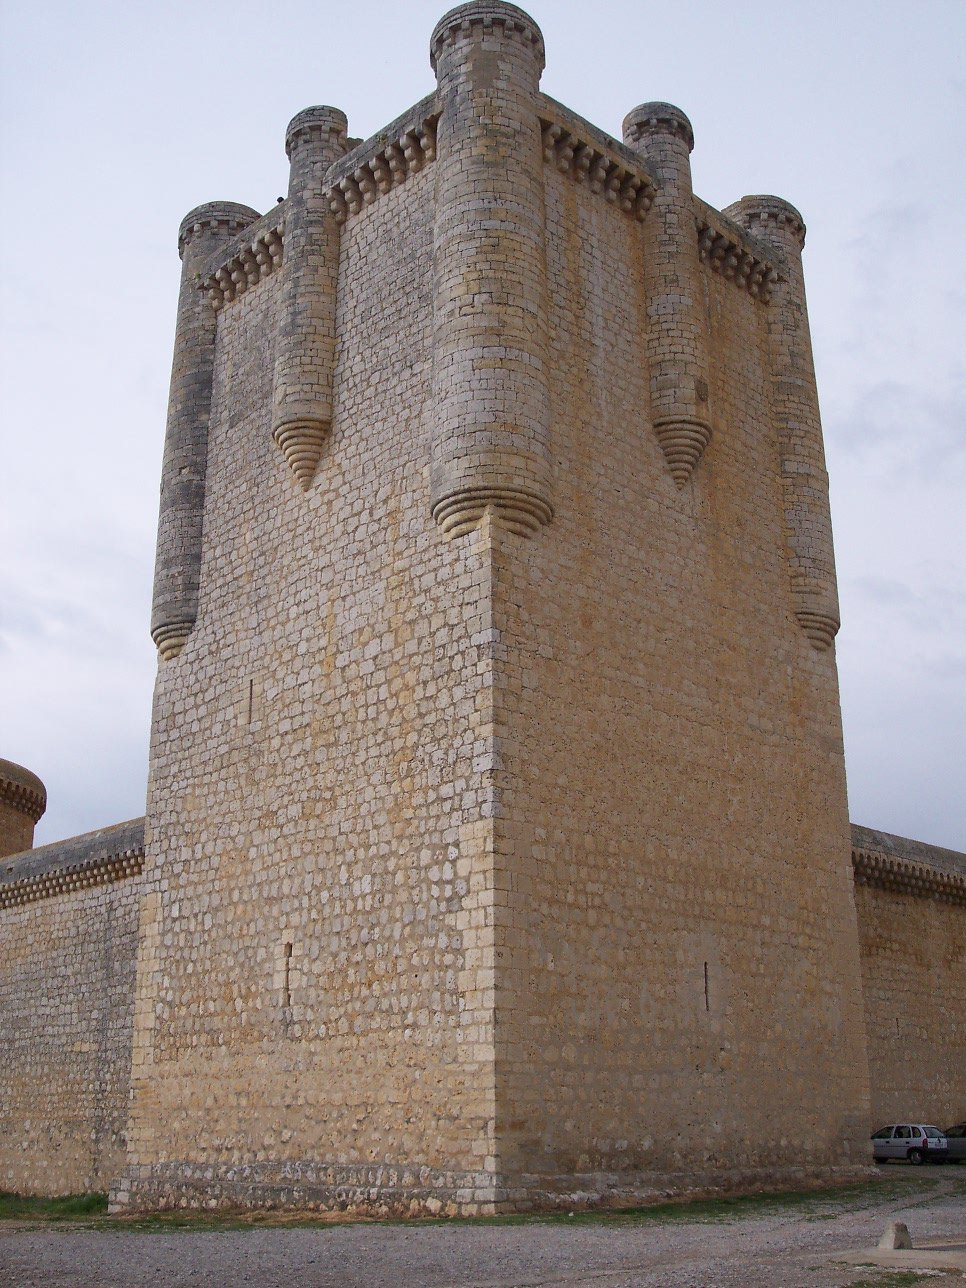 Castillo de Torrelobatón (torre del homenaje)